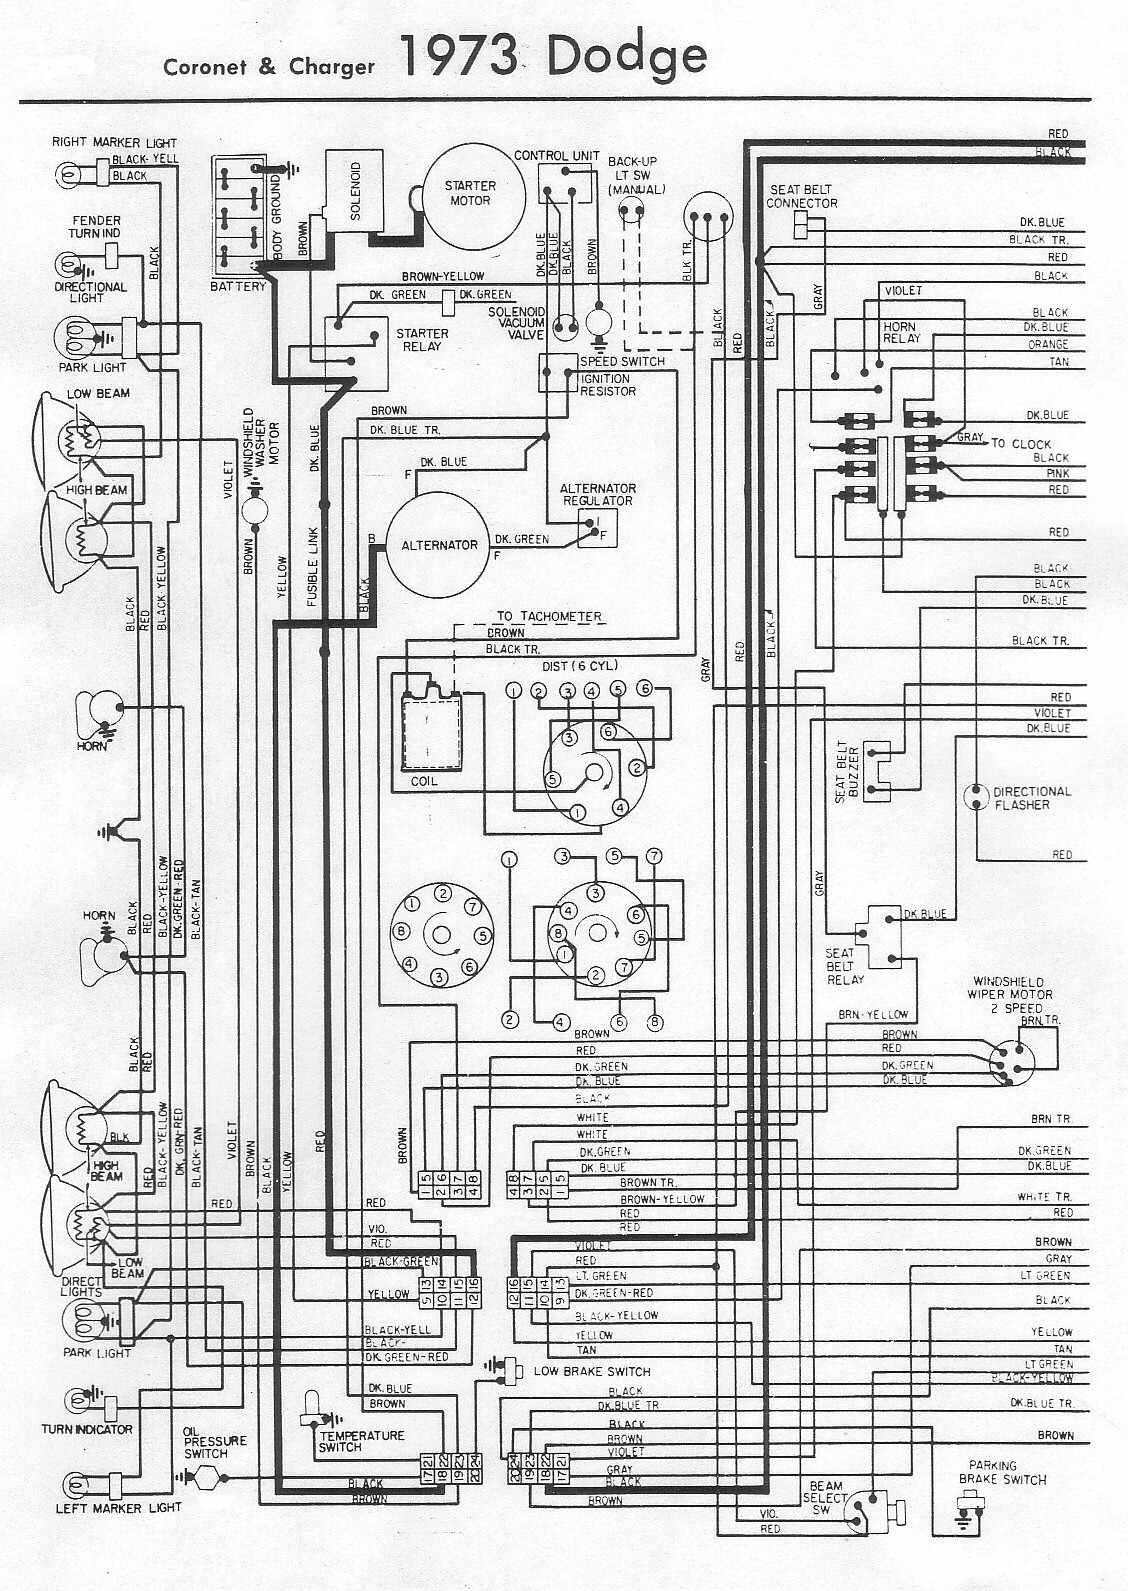 hight resolution of 1973 dodge challenger wiring diagram somurich com 08 dodge charger wiring diagrams automotive dodge wiring diagram wires